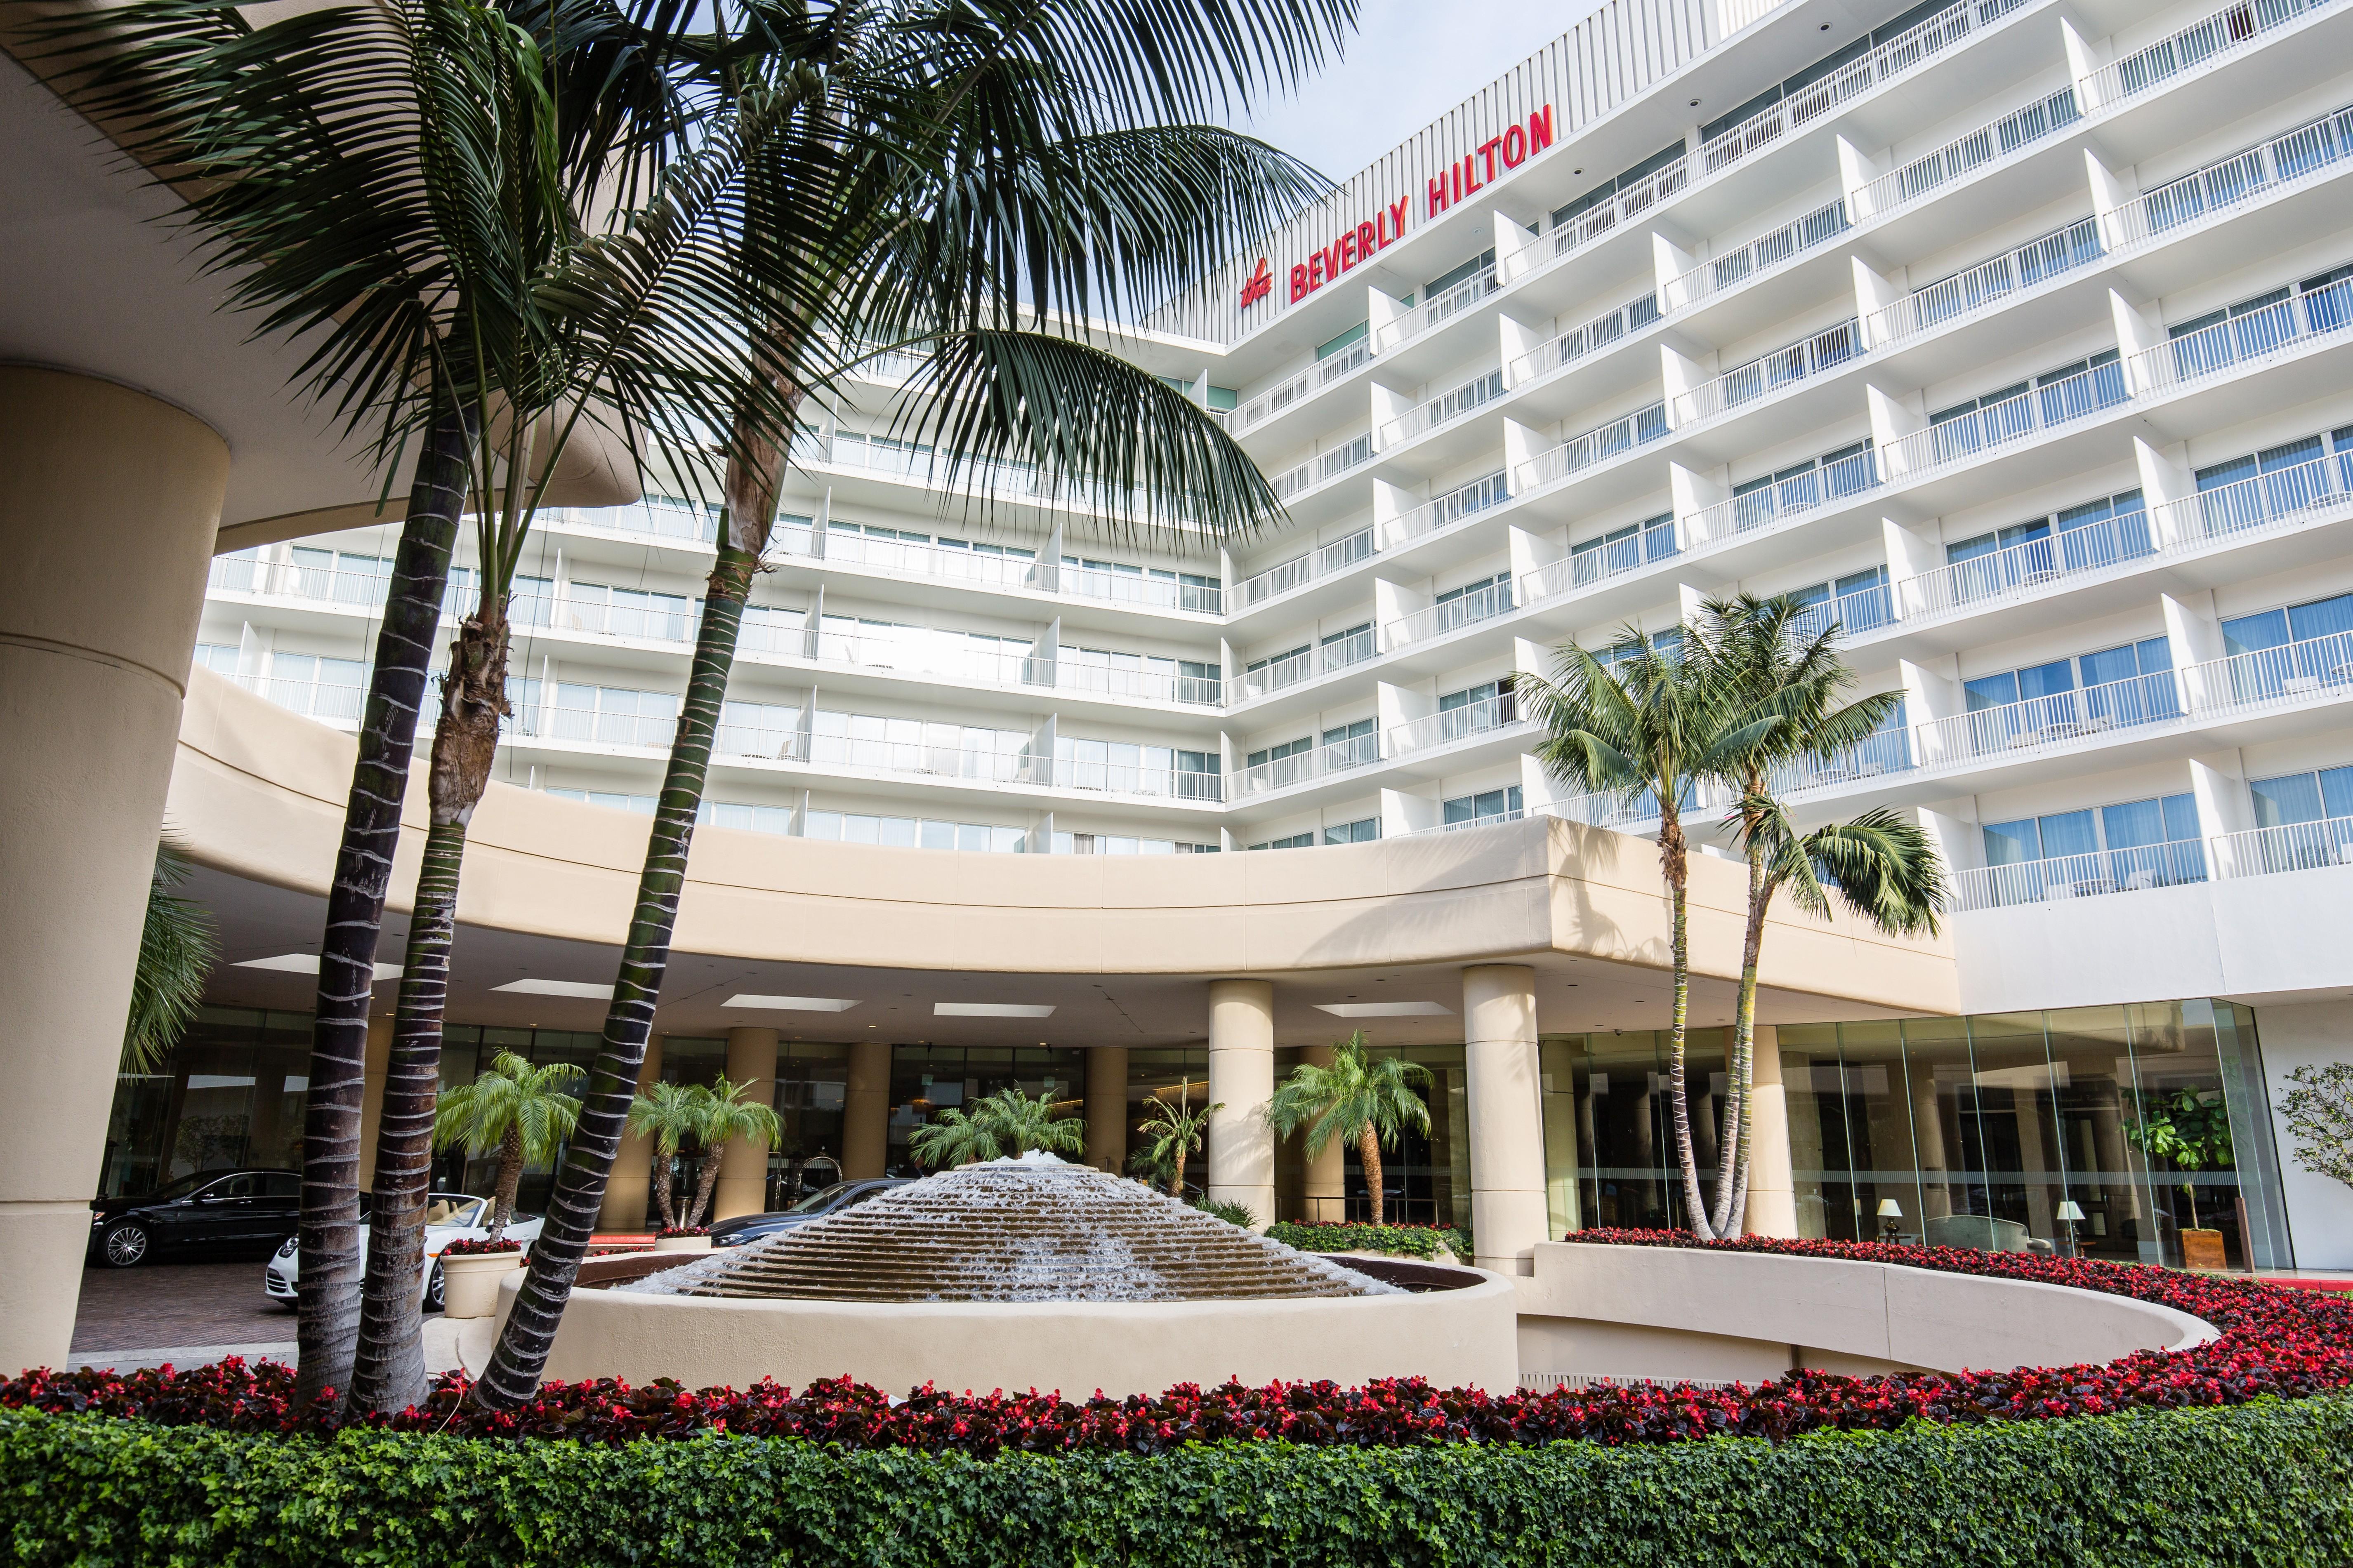 The Beverly Hilton | LinkedIn